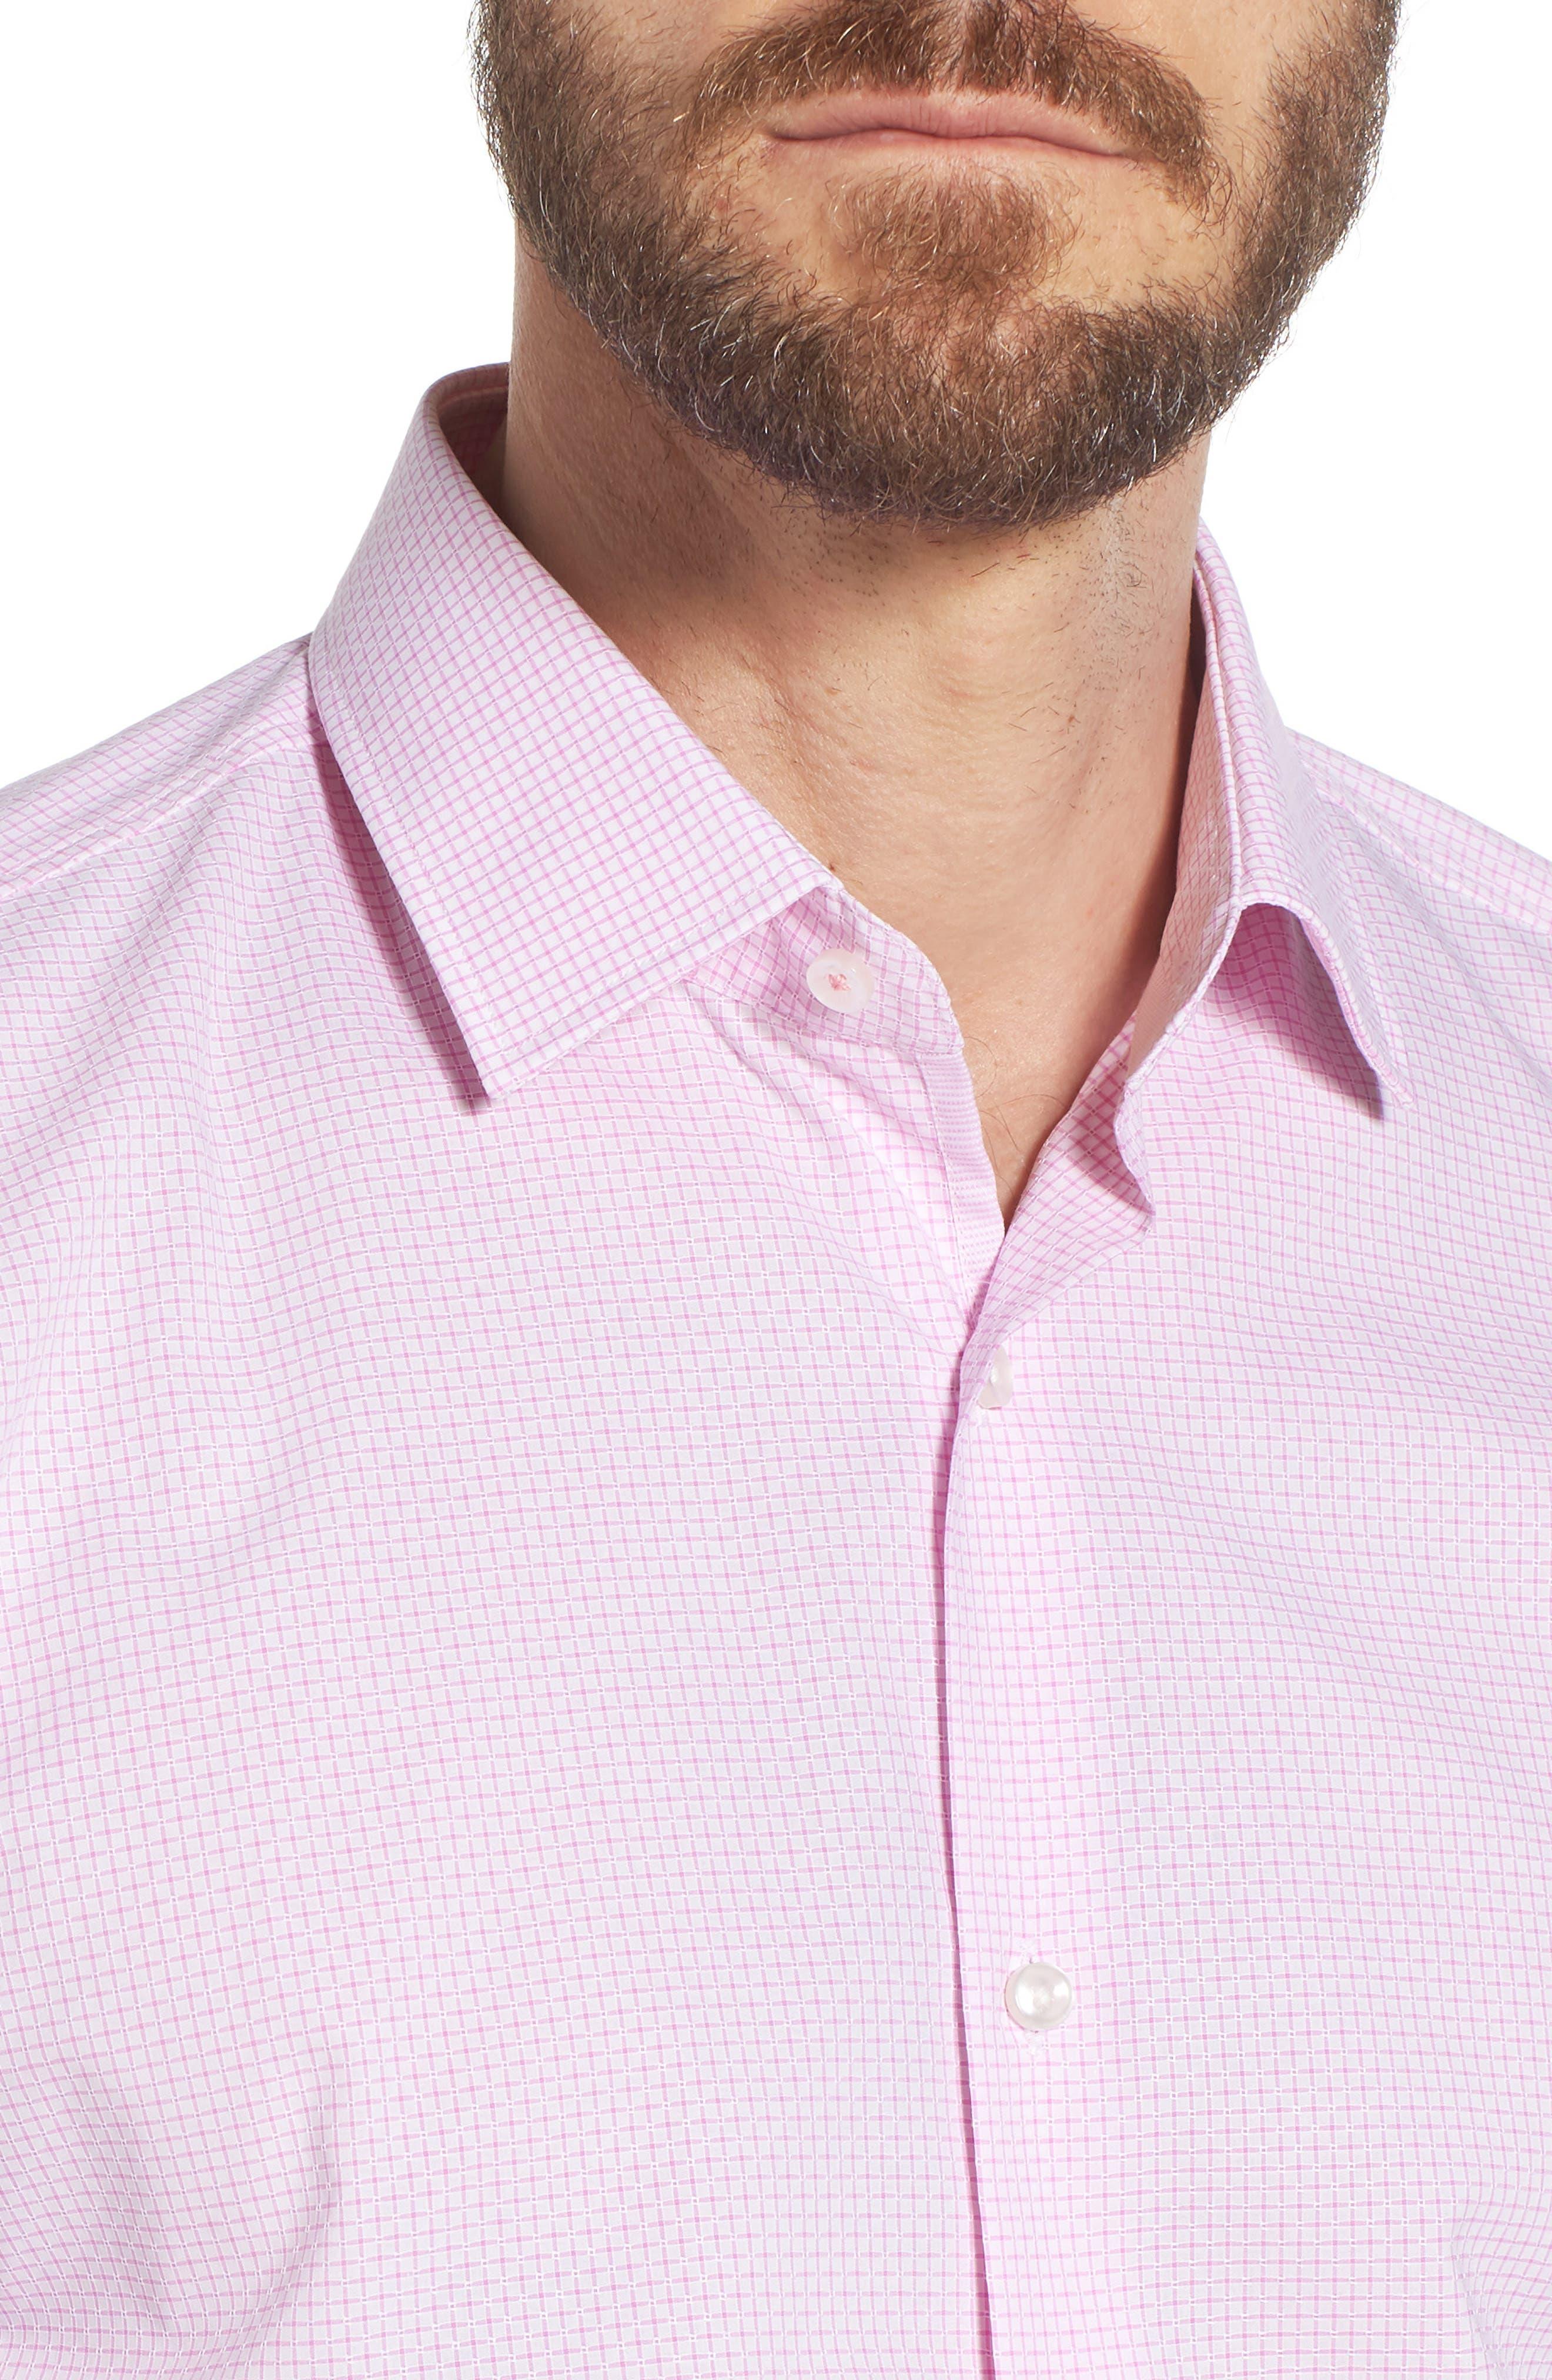 Jesse Slim Fit Check Dress Shirt,                             Alternate thumbnail 2, color,                             Pink